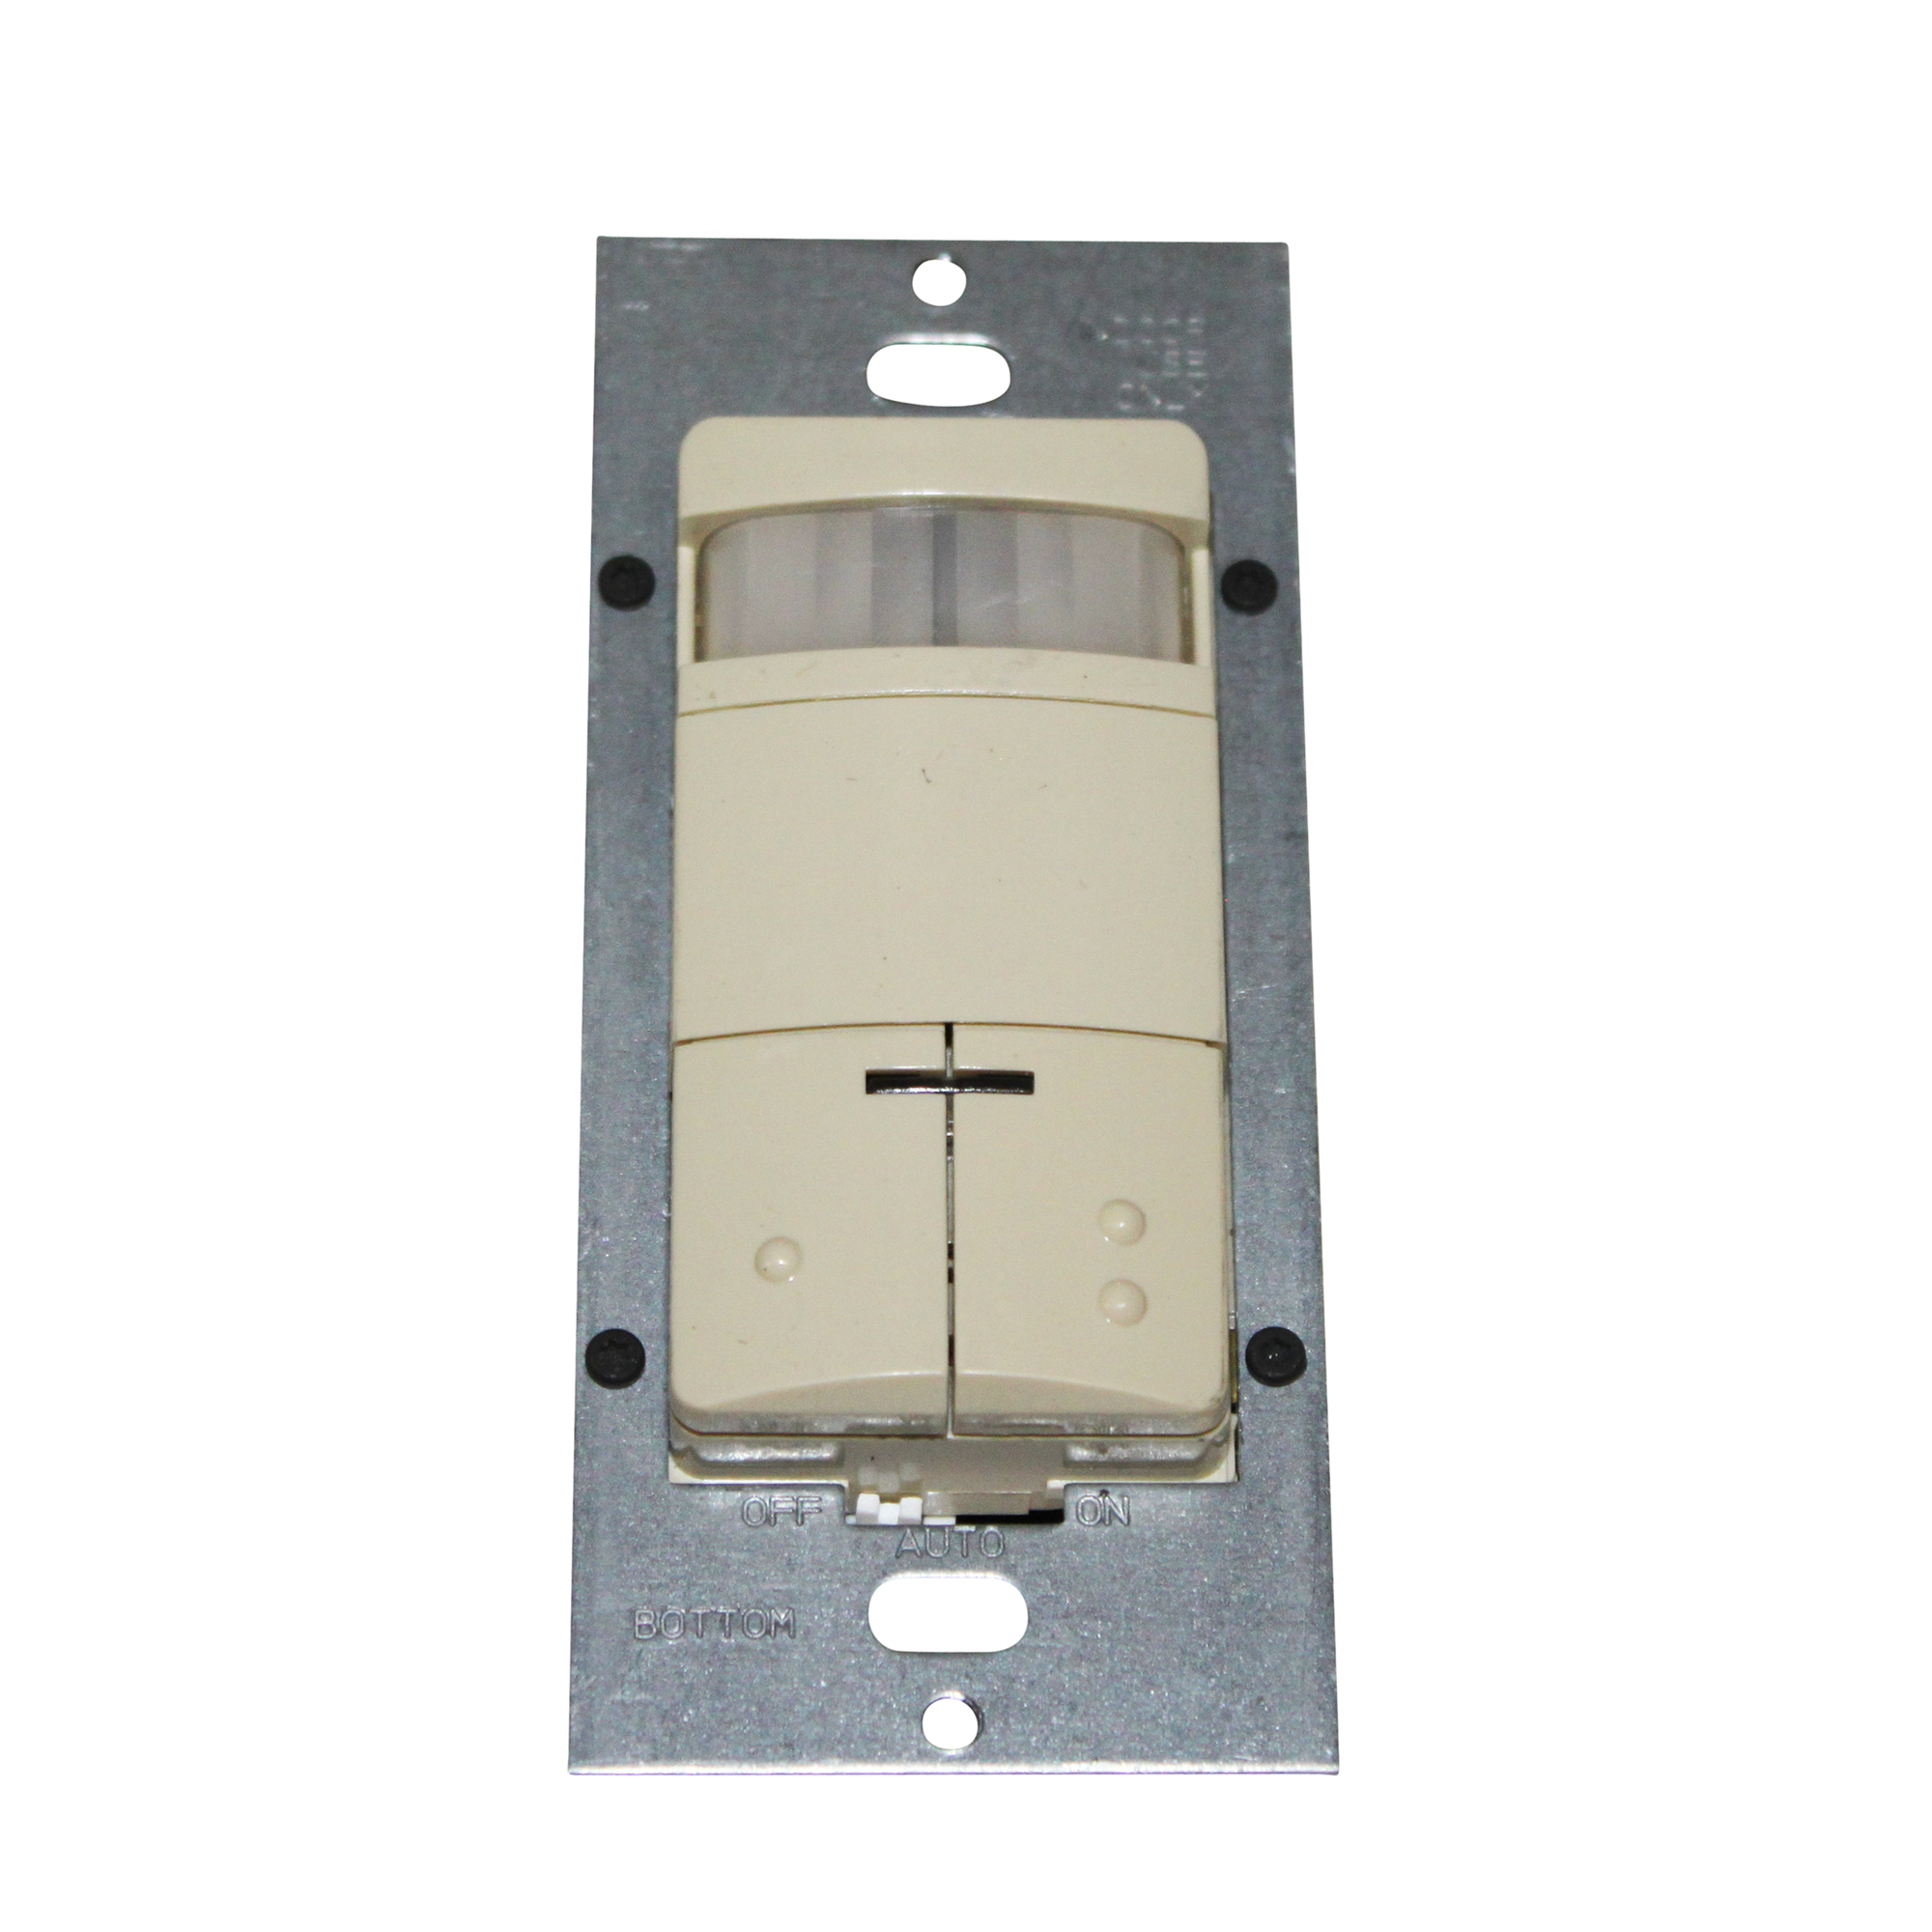 lithonia lighting lirw pp 120 277v occupancy sensor wall switch pir. Black Bedroom Furniture Sets. Home Design Ideas